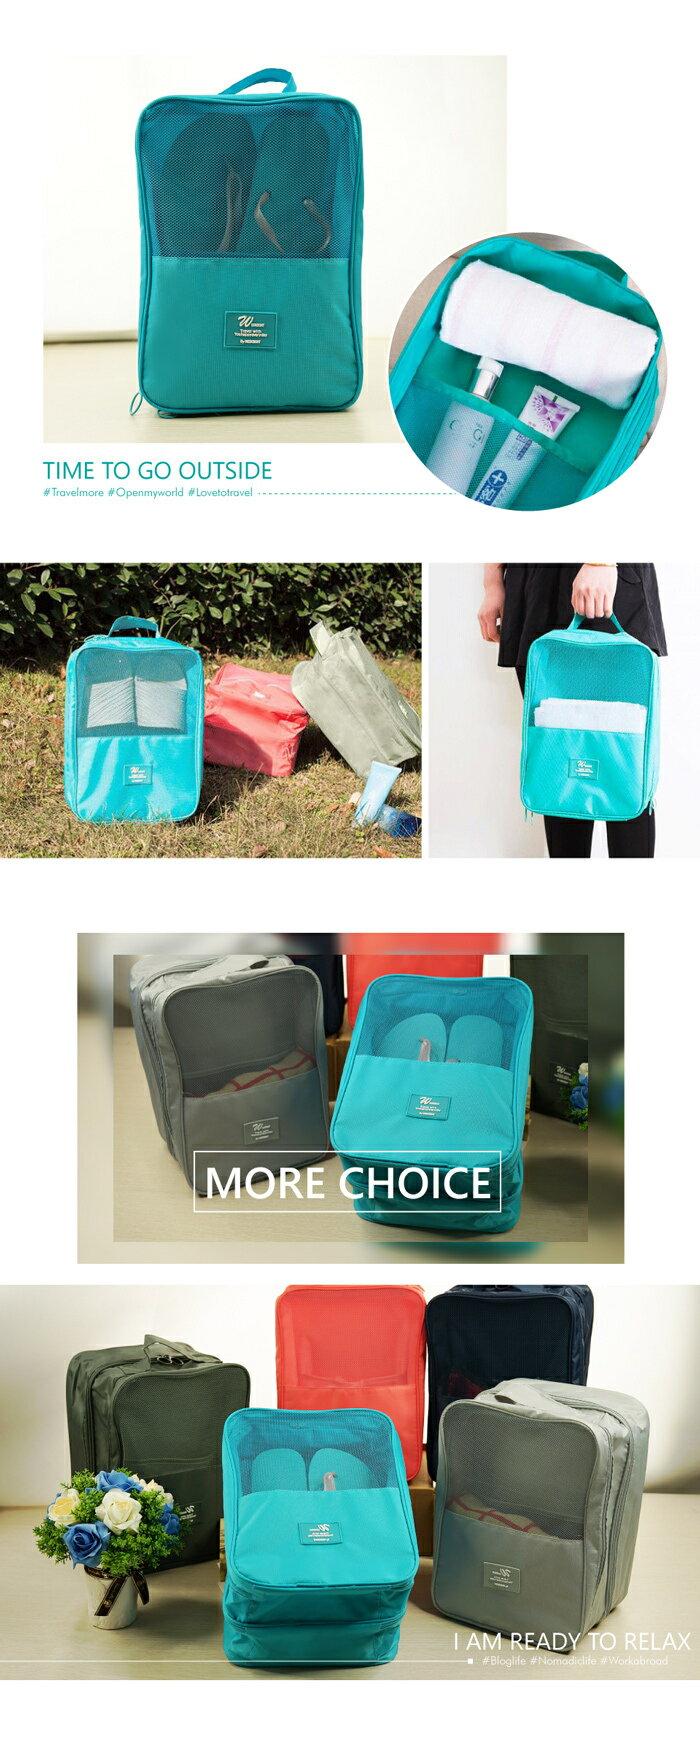 JIDA 簡約乾濕兩用雙層手提鞋袋-顏色隨機出貨(31X23X19cm) [大買家] 3